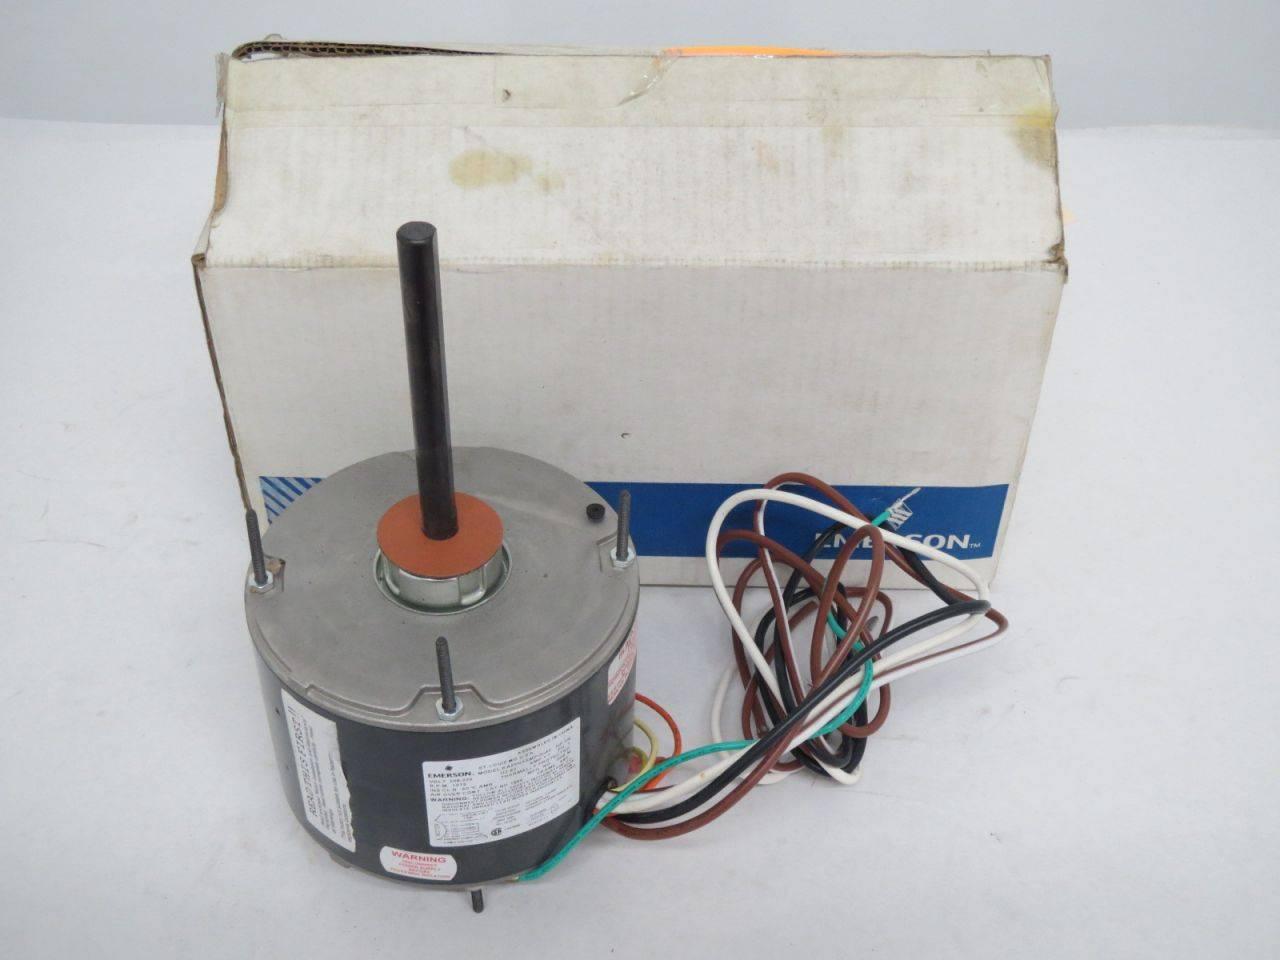 EMERSON KA55HXBPK-1315 Blower Motor 1//3HP 115V 1140RPM 3SPD 1PH 1067-620